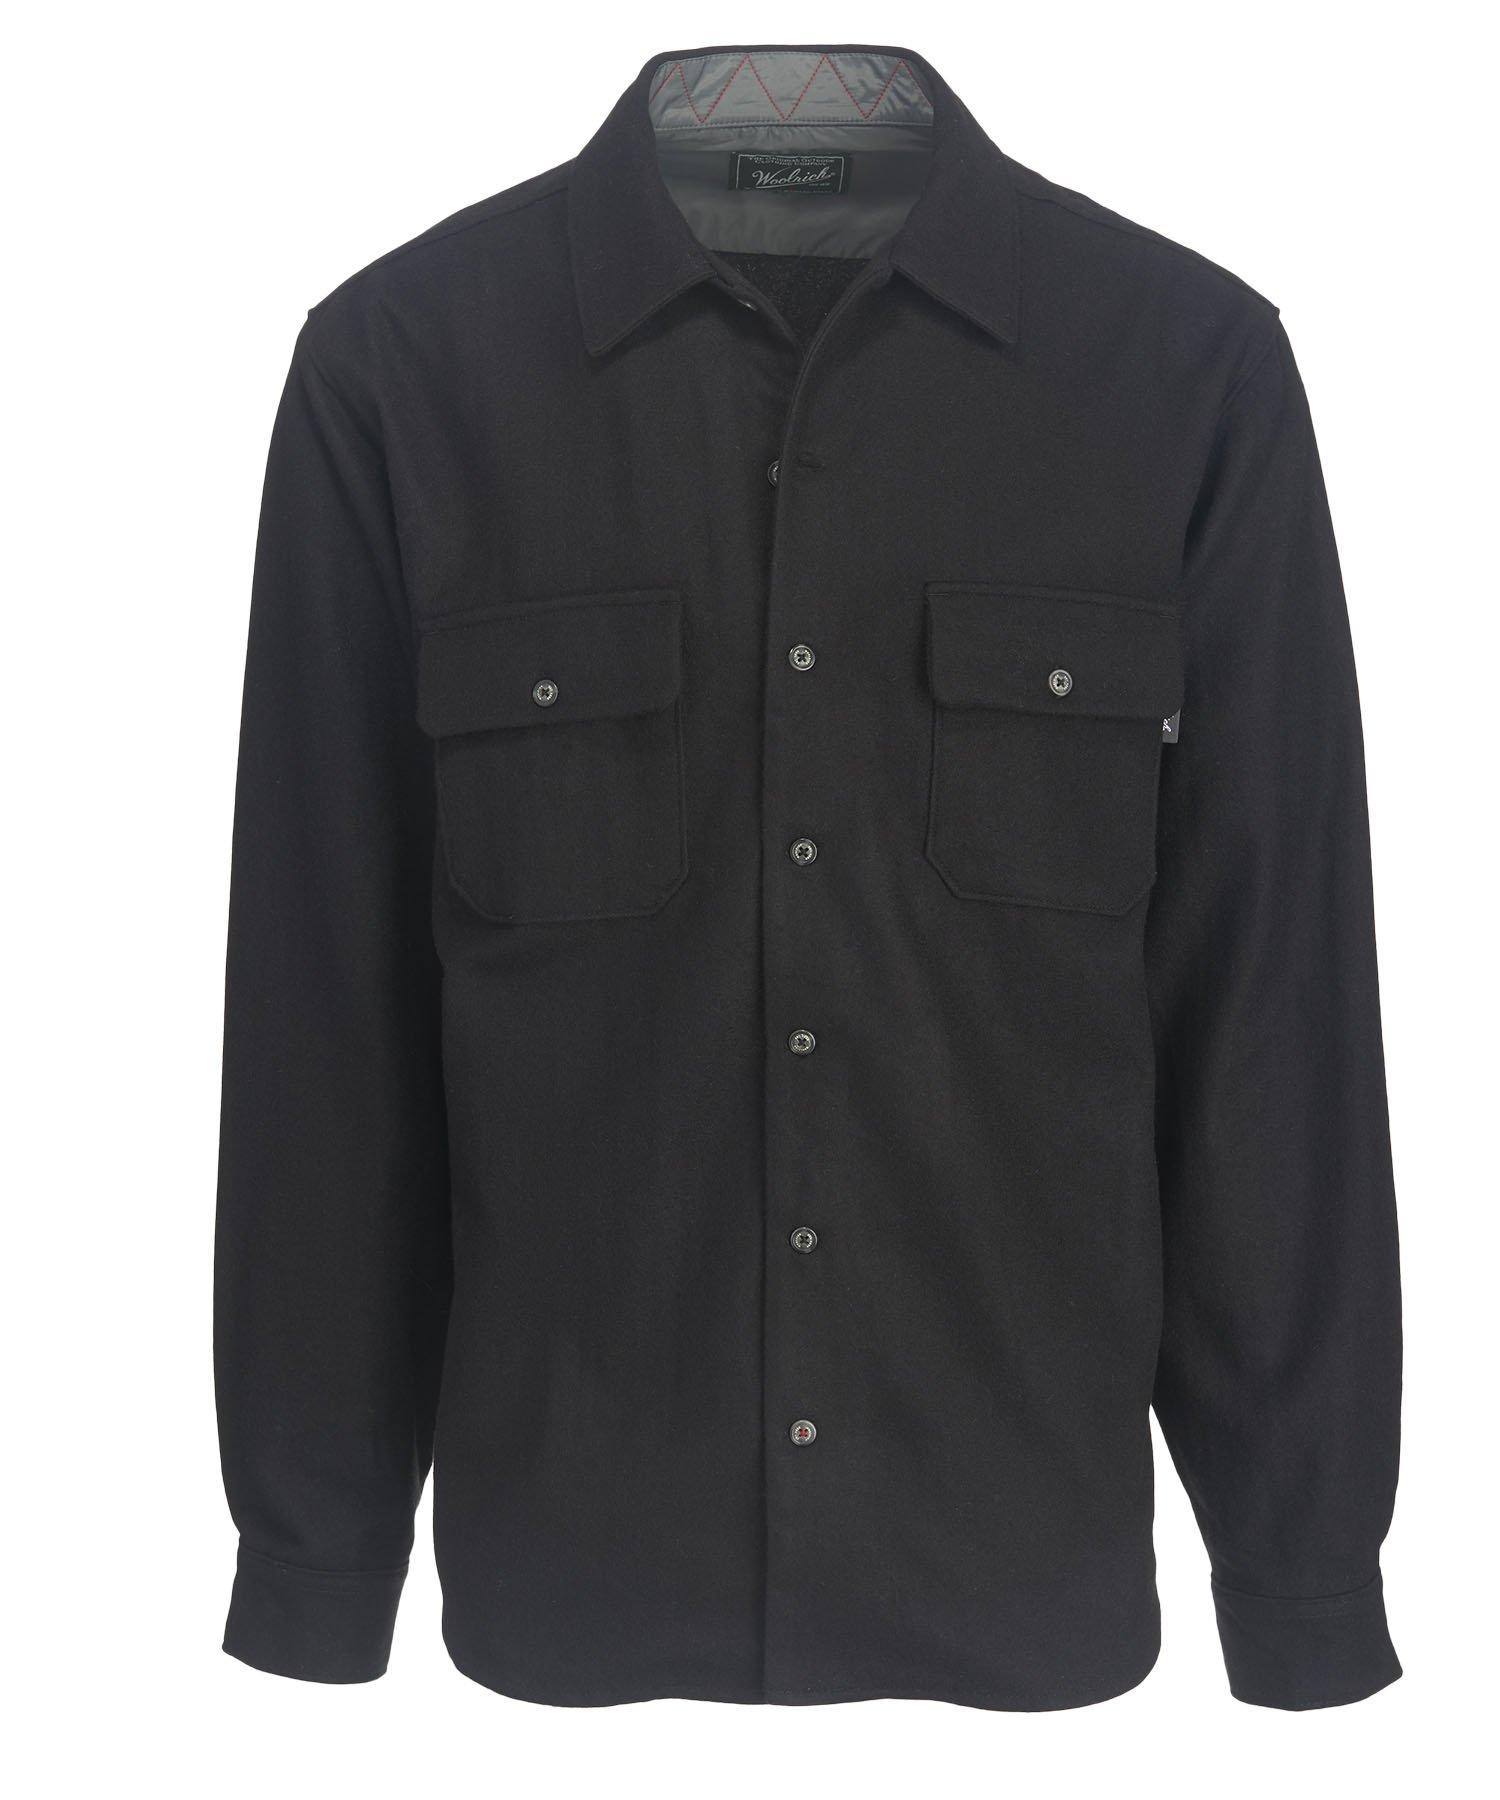 Woolrich Men's Bering Wool Plaid Shirt, Solid Black, Large